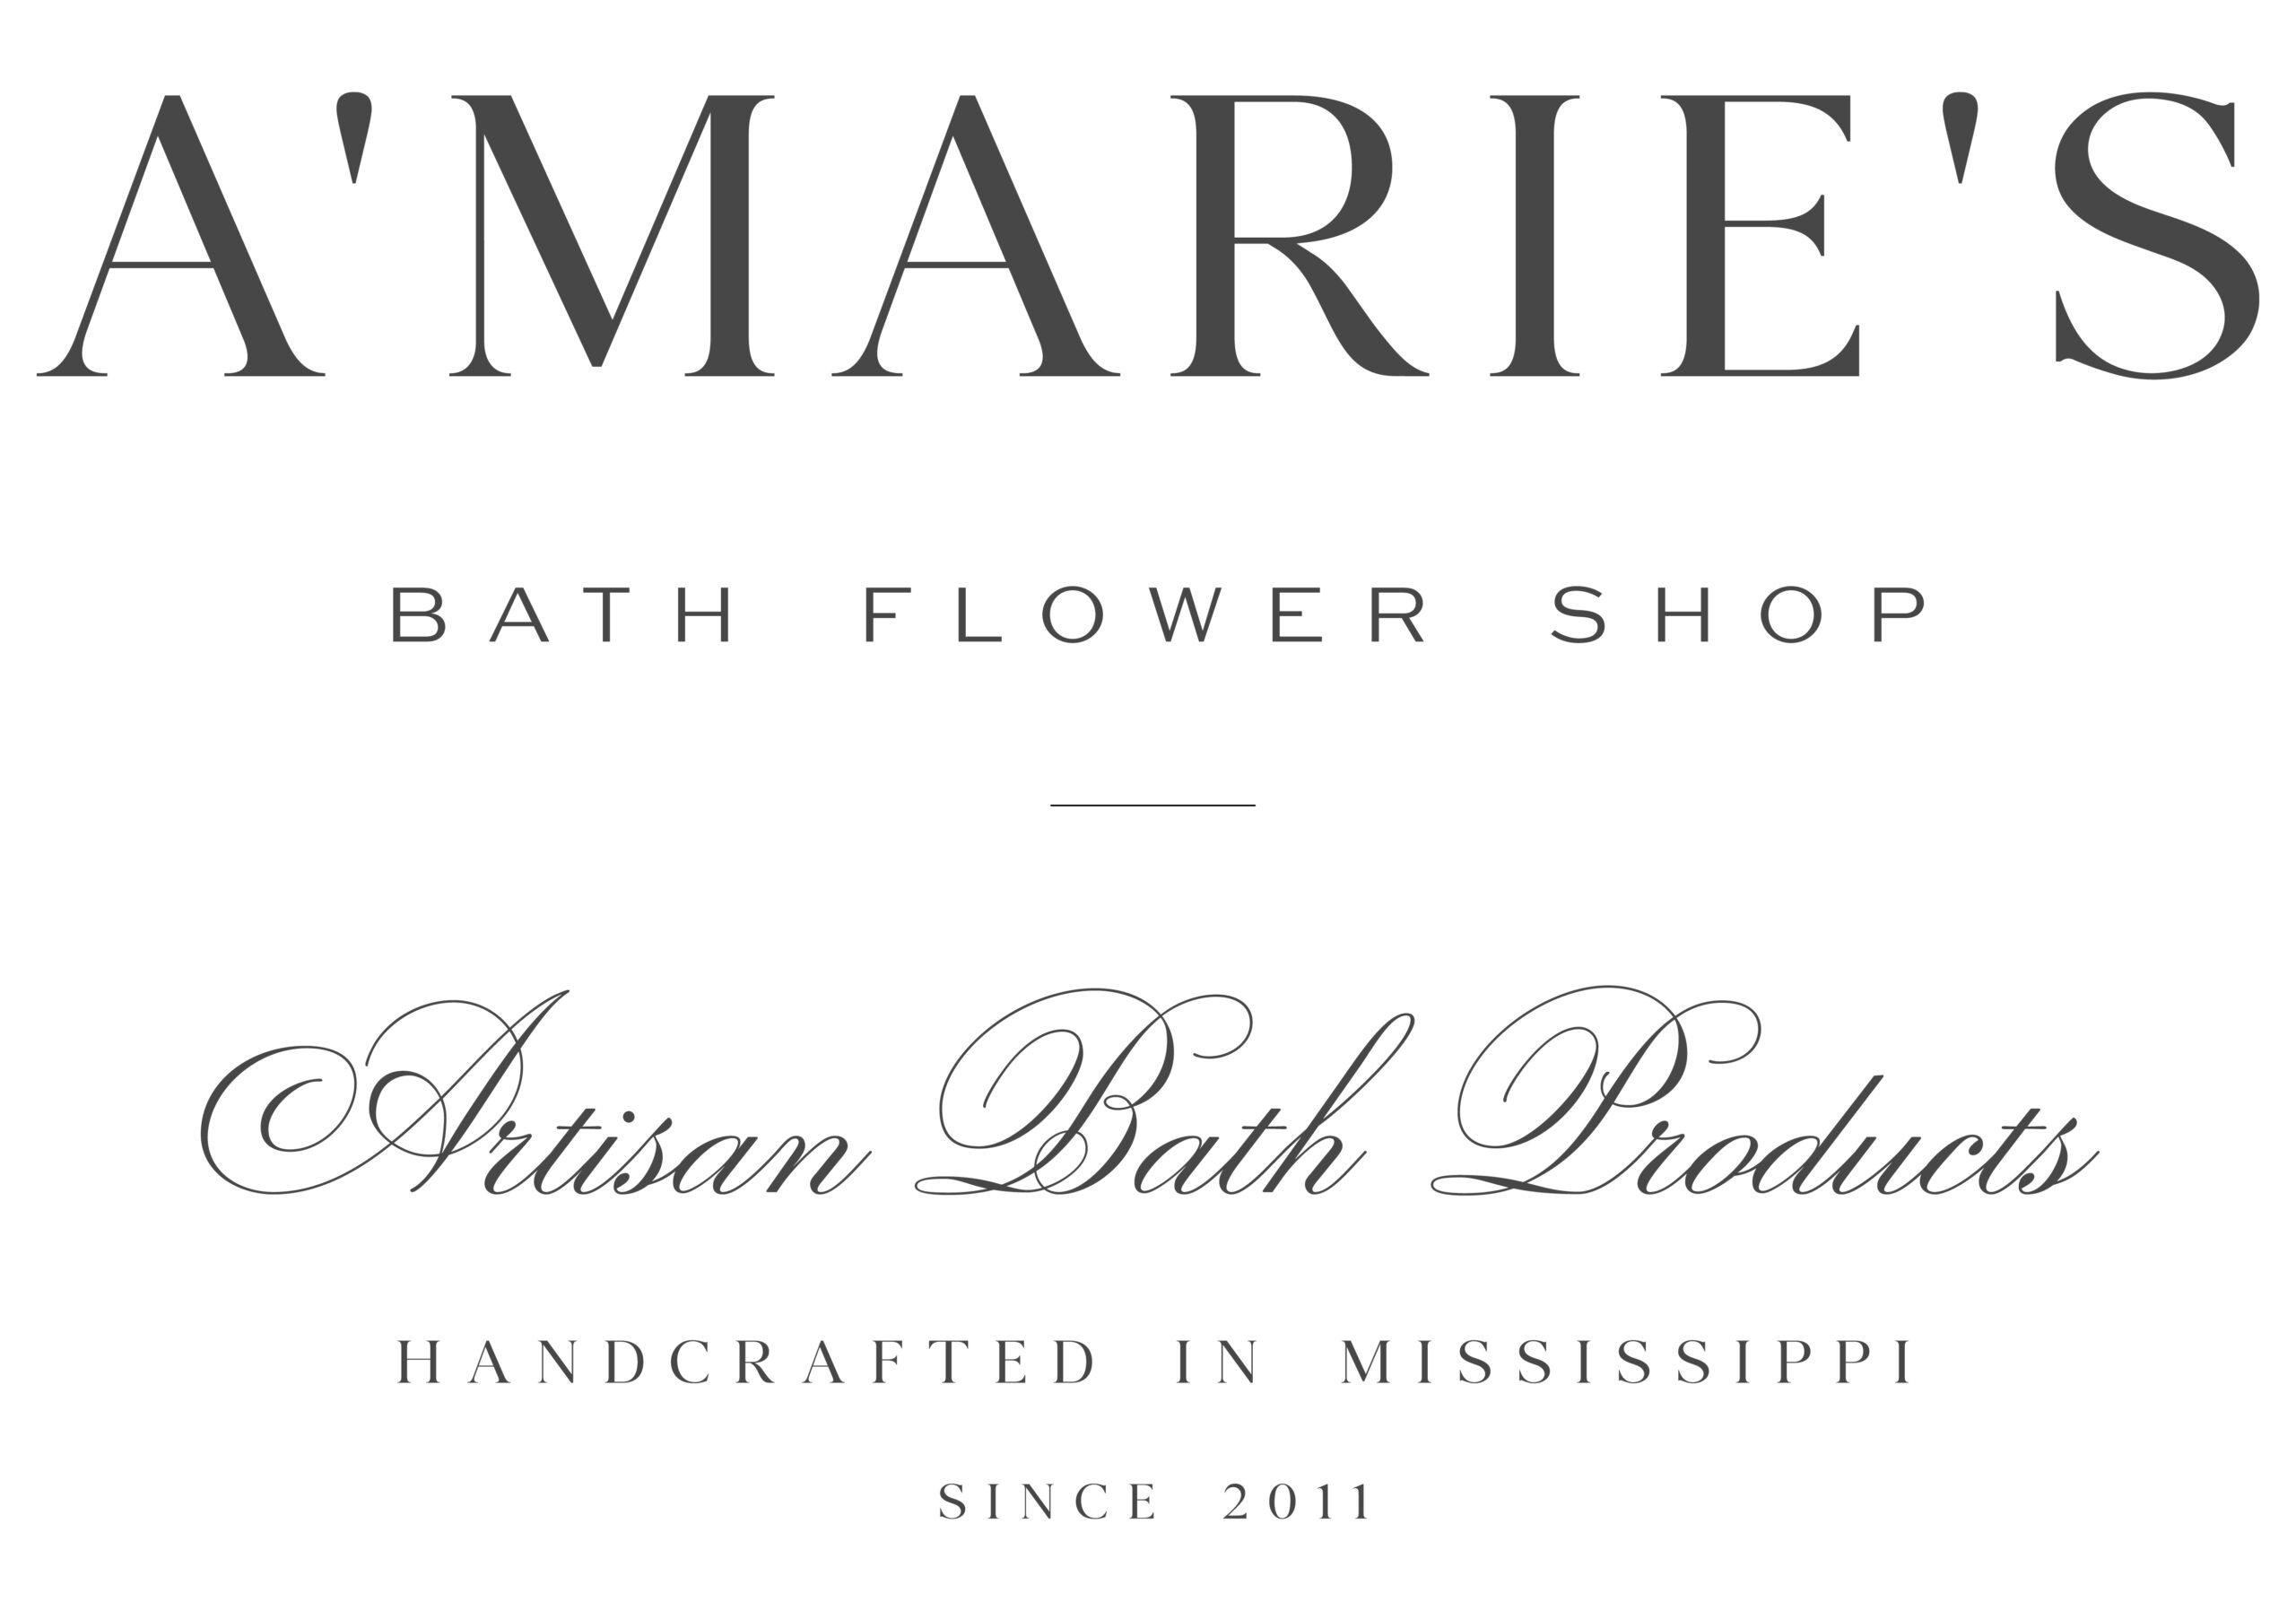 Amaries Bath Flower Shop